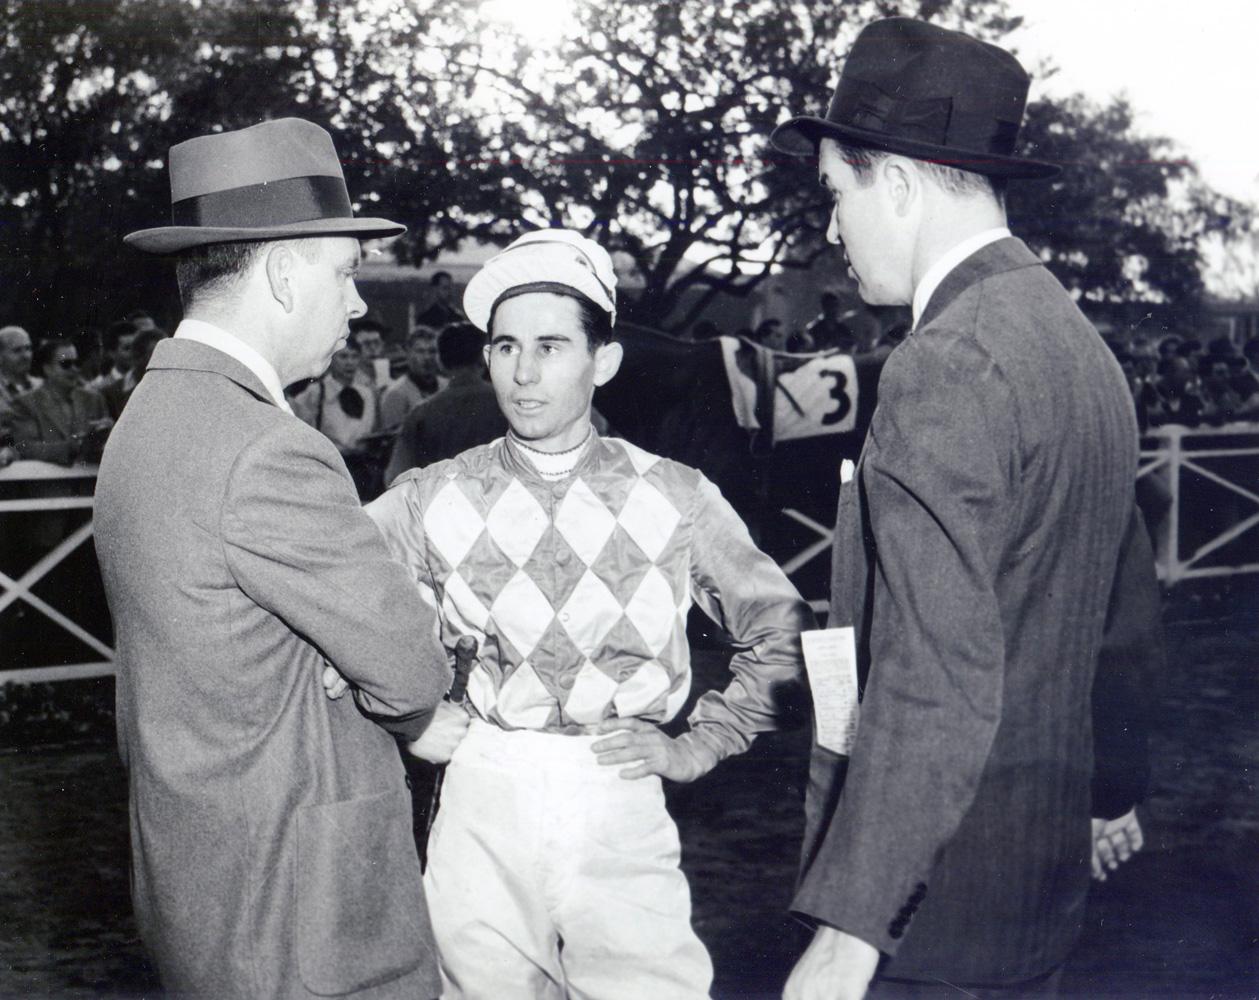 Trainer William C. Winfrey, jockey Eric Guerin, and owner Alfred G. Vanderbilt II in the Santa Anita paddock, circa 1952 (Bill Mochon/Museum Collection)